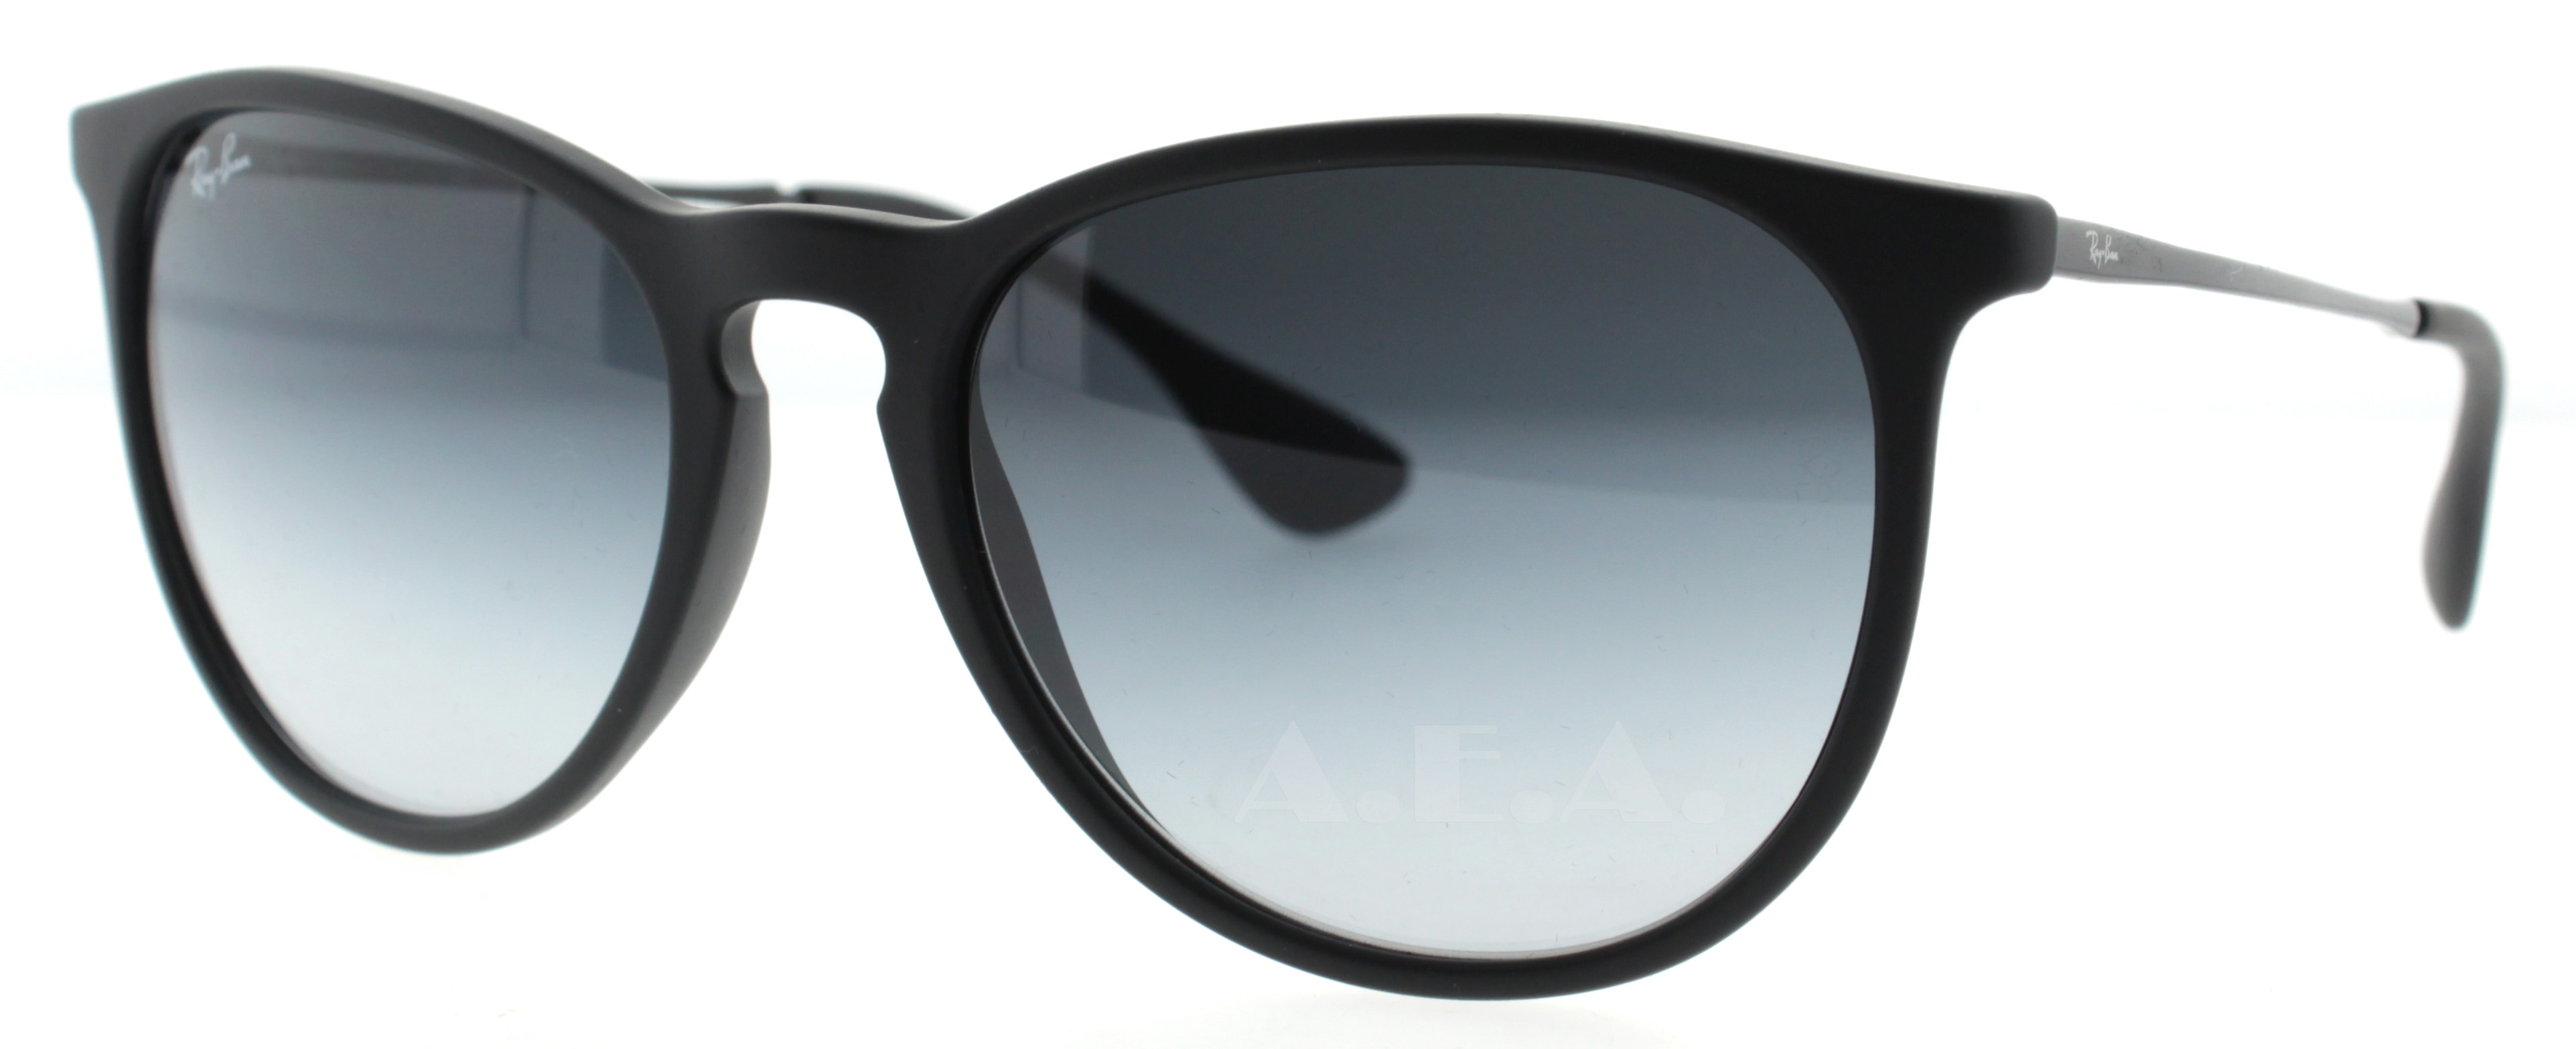 ray ban rb 4171 erika round unisex sunglasses ebay. Black Bedroom Furniture Sets. Home Design Ideas